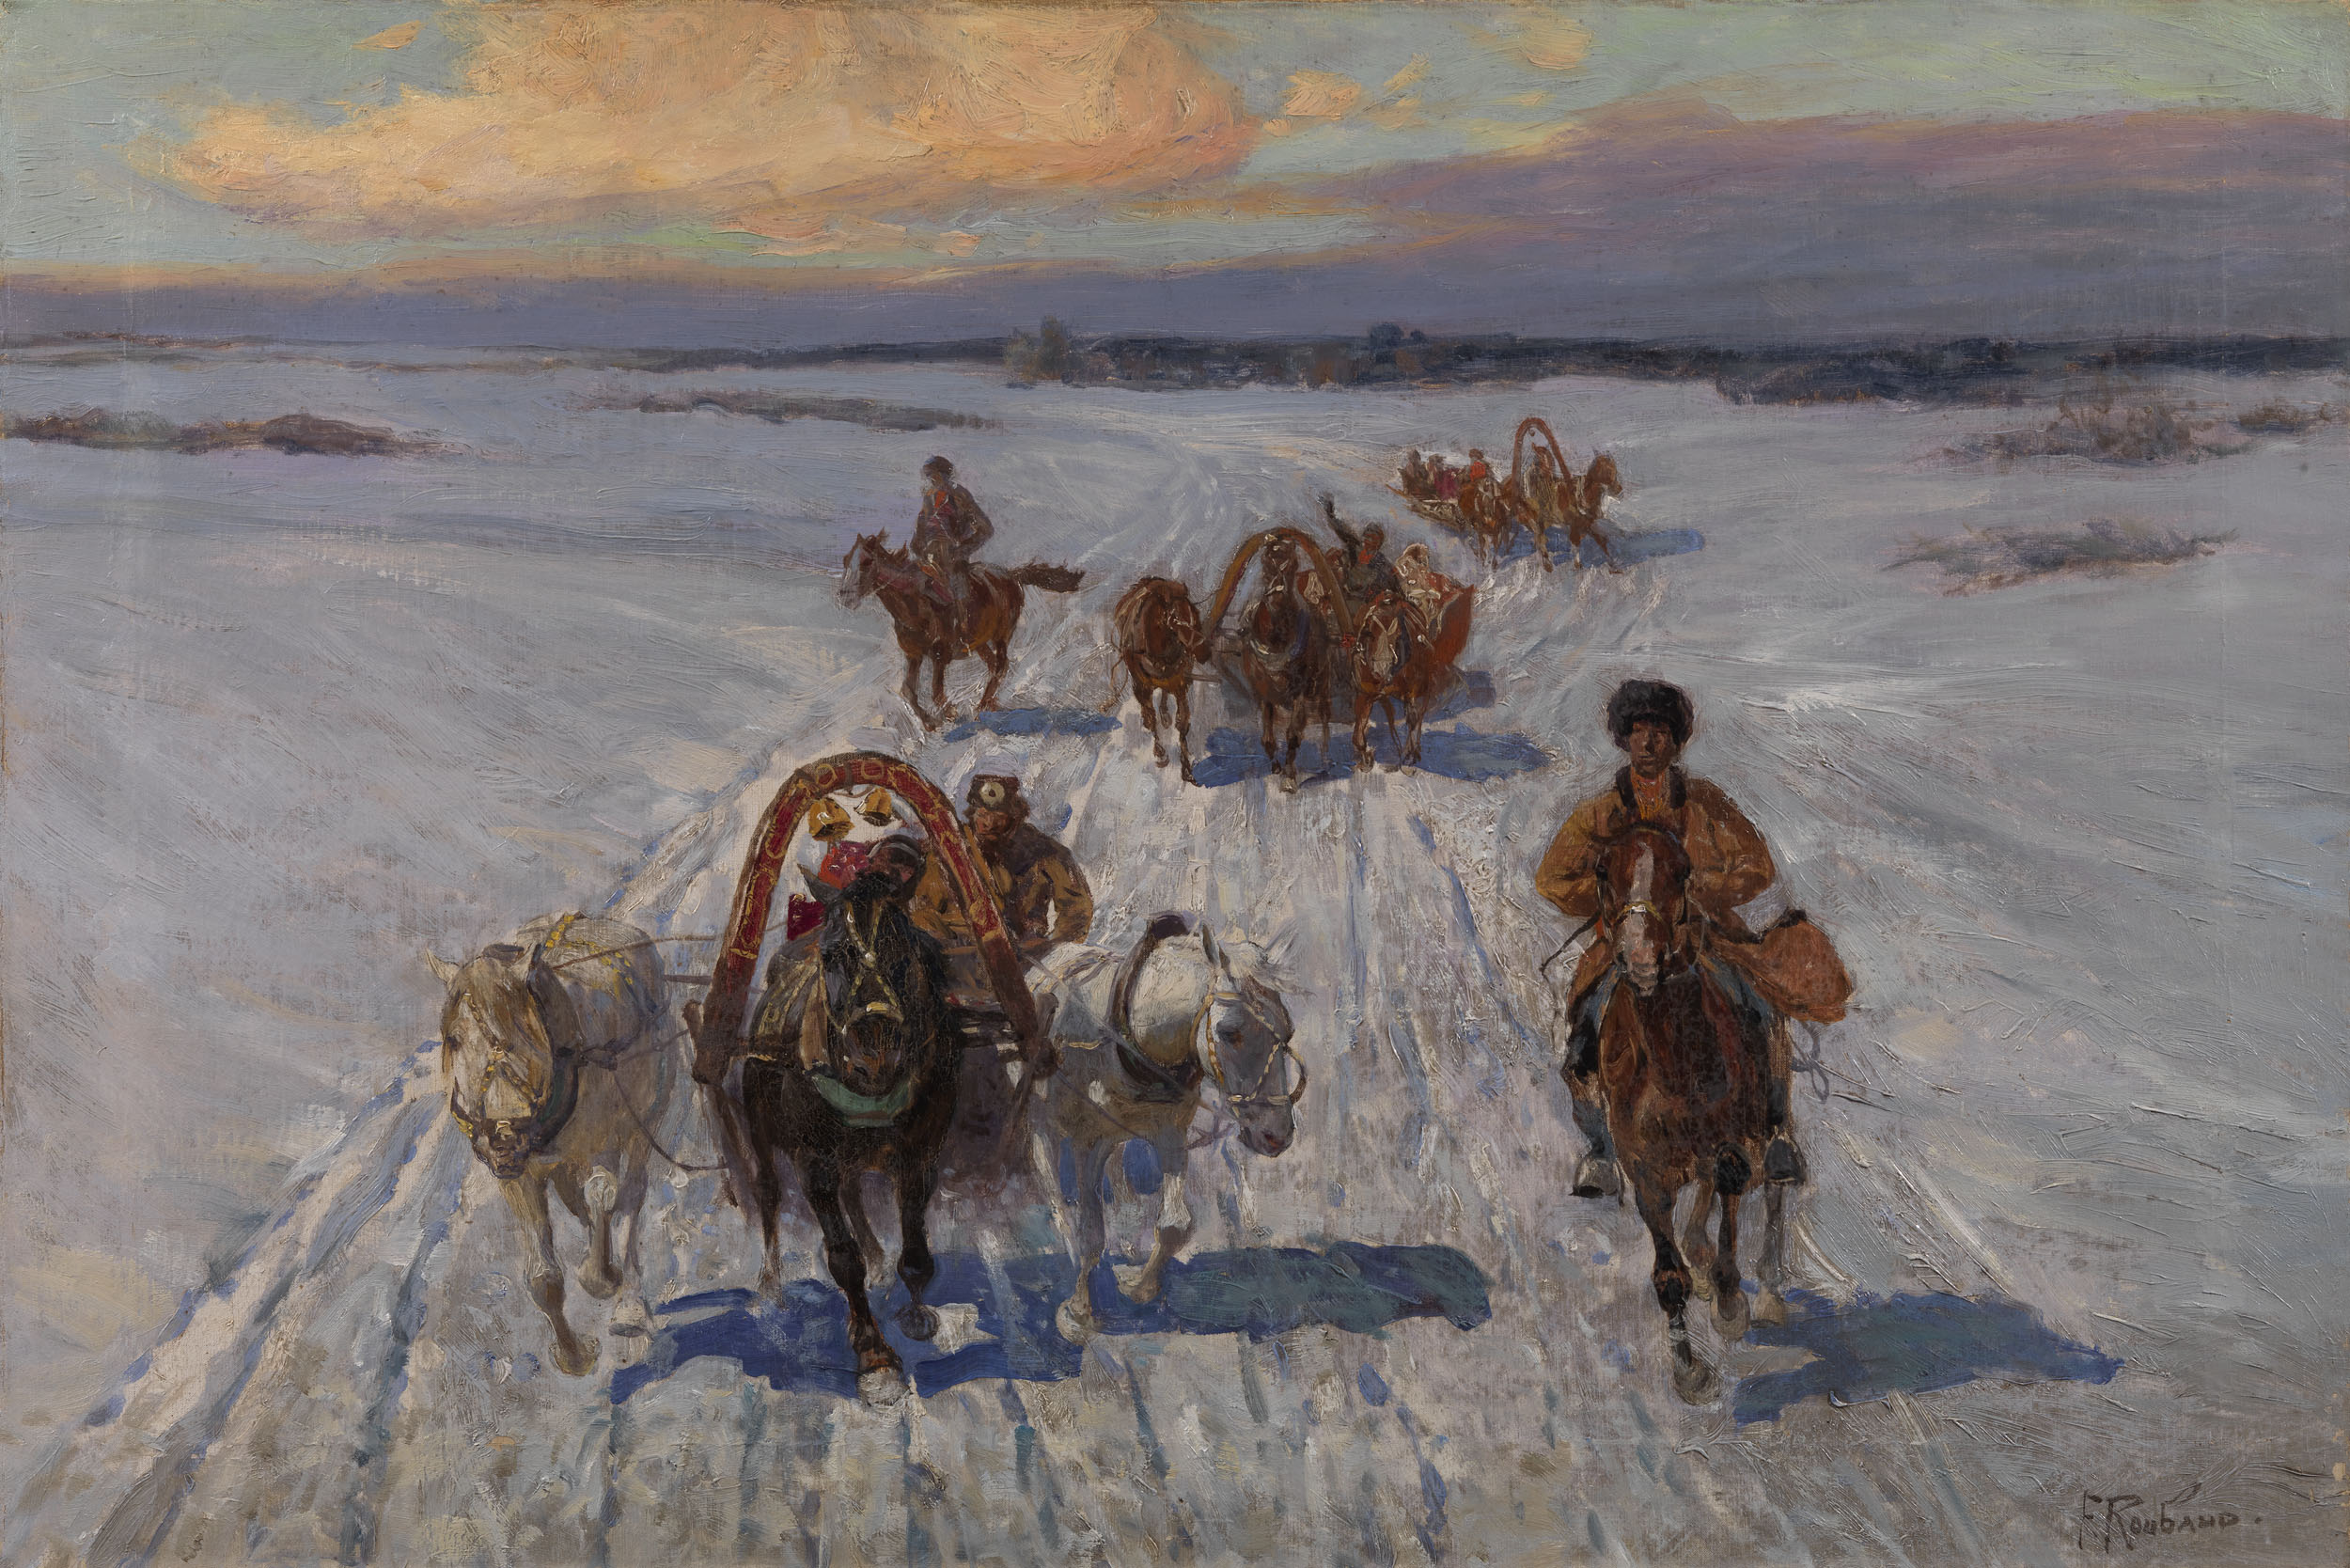 ROUBAUD, FRANTS Peasants on Troikas in Winter